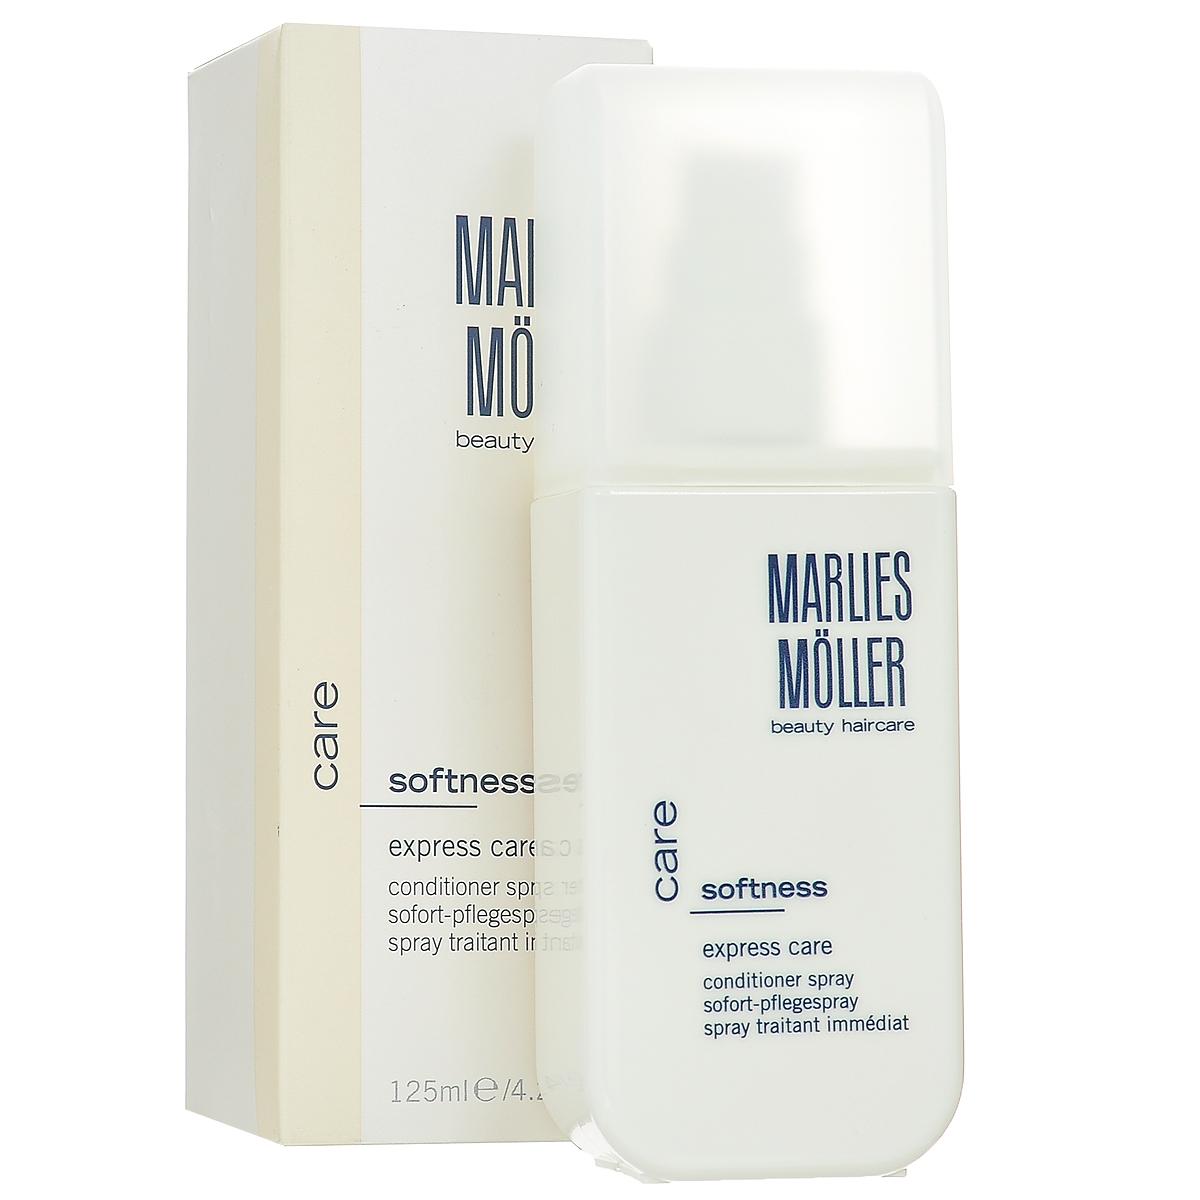 Marlies Moller Кондиционер-спрей для волос Softness, интенсивный, 125 мл спрей marlies moller luxury golden caviar spray 150 мл